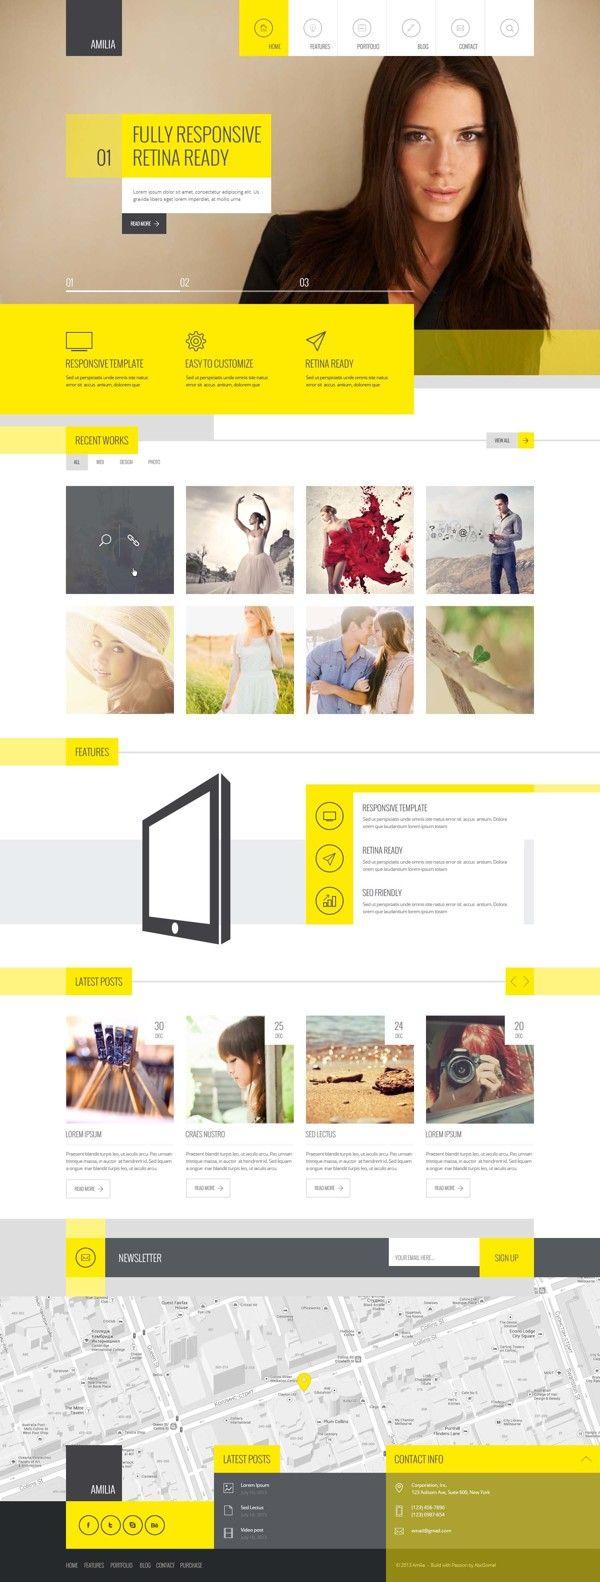 Pin On Web